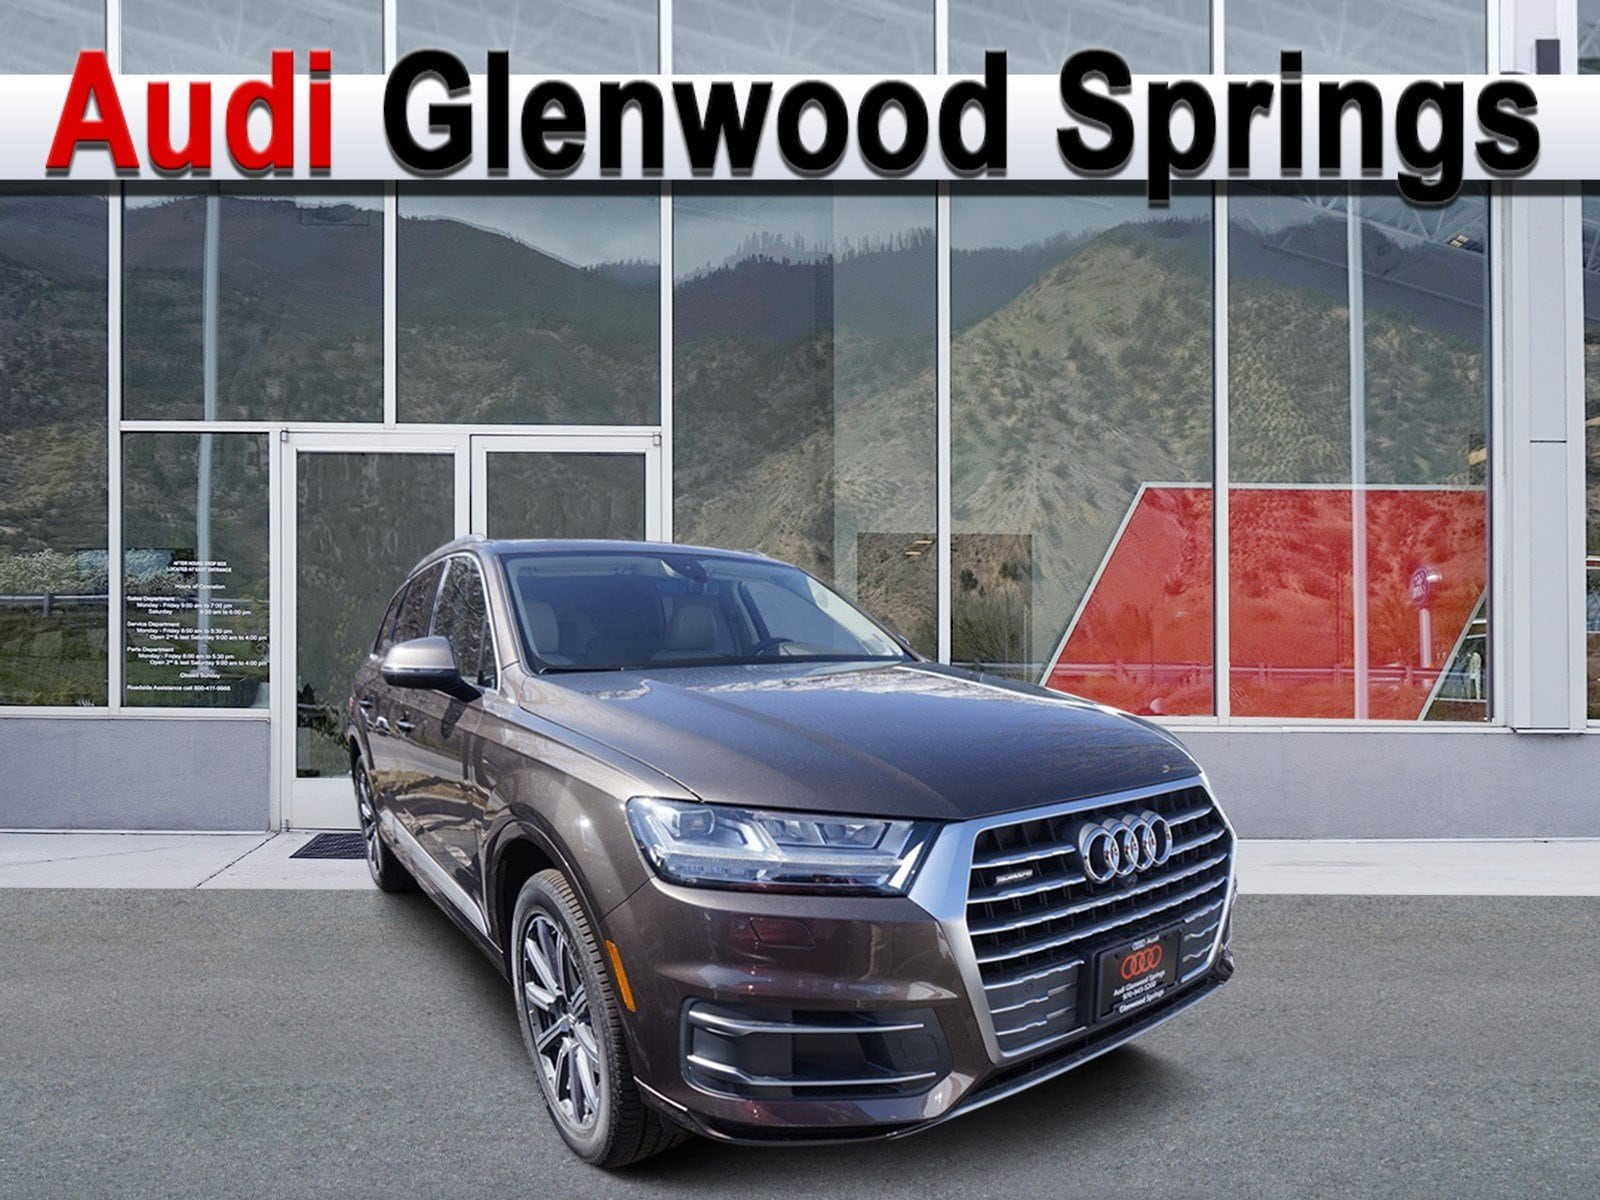 2019 Audi Q7 Sport Utility Vehicle